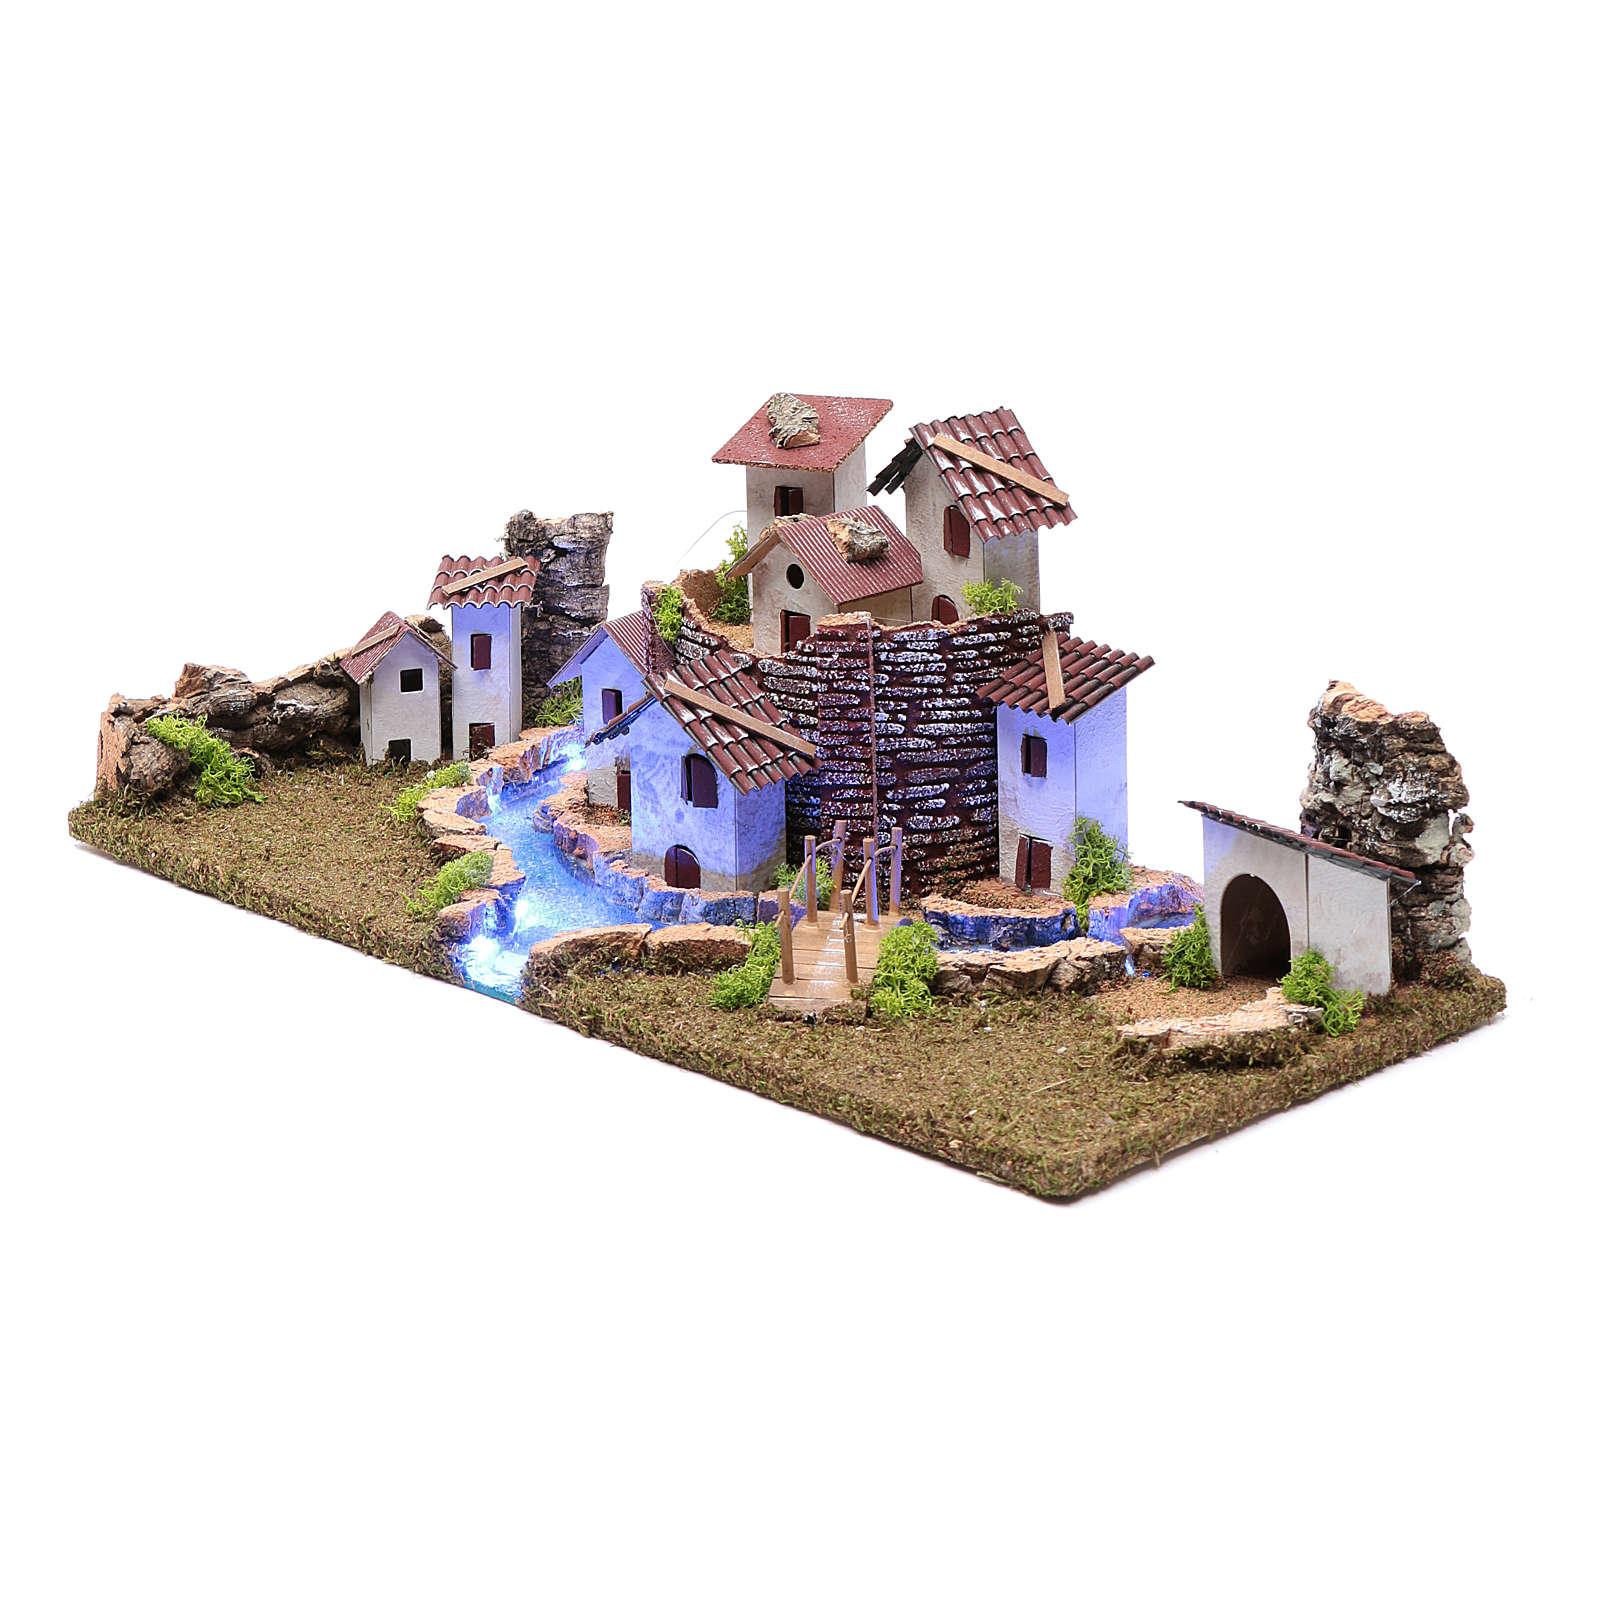 Nativity scene village with illuminated river 18X55X24 cm 4